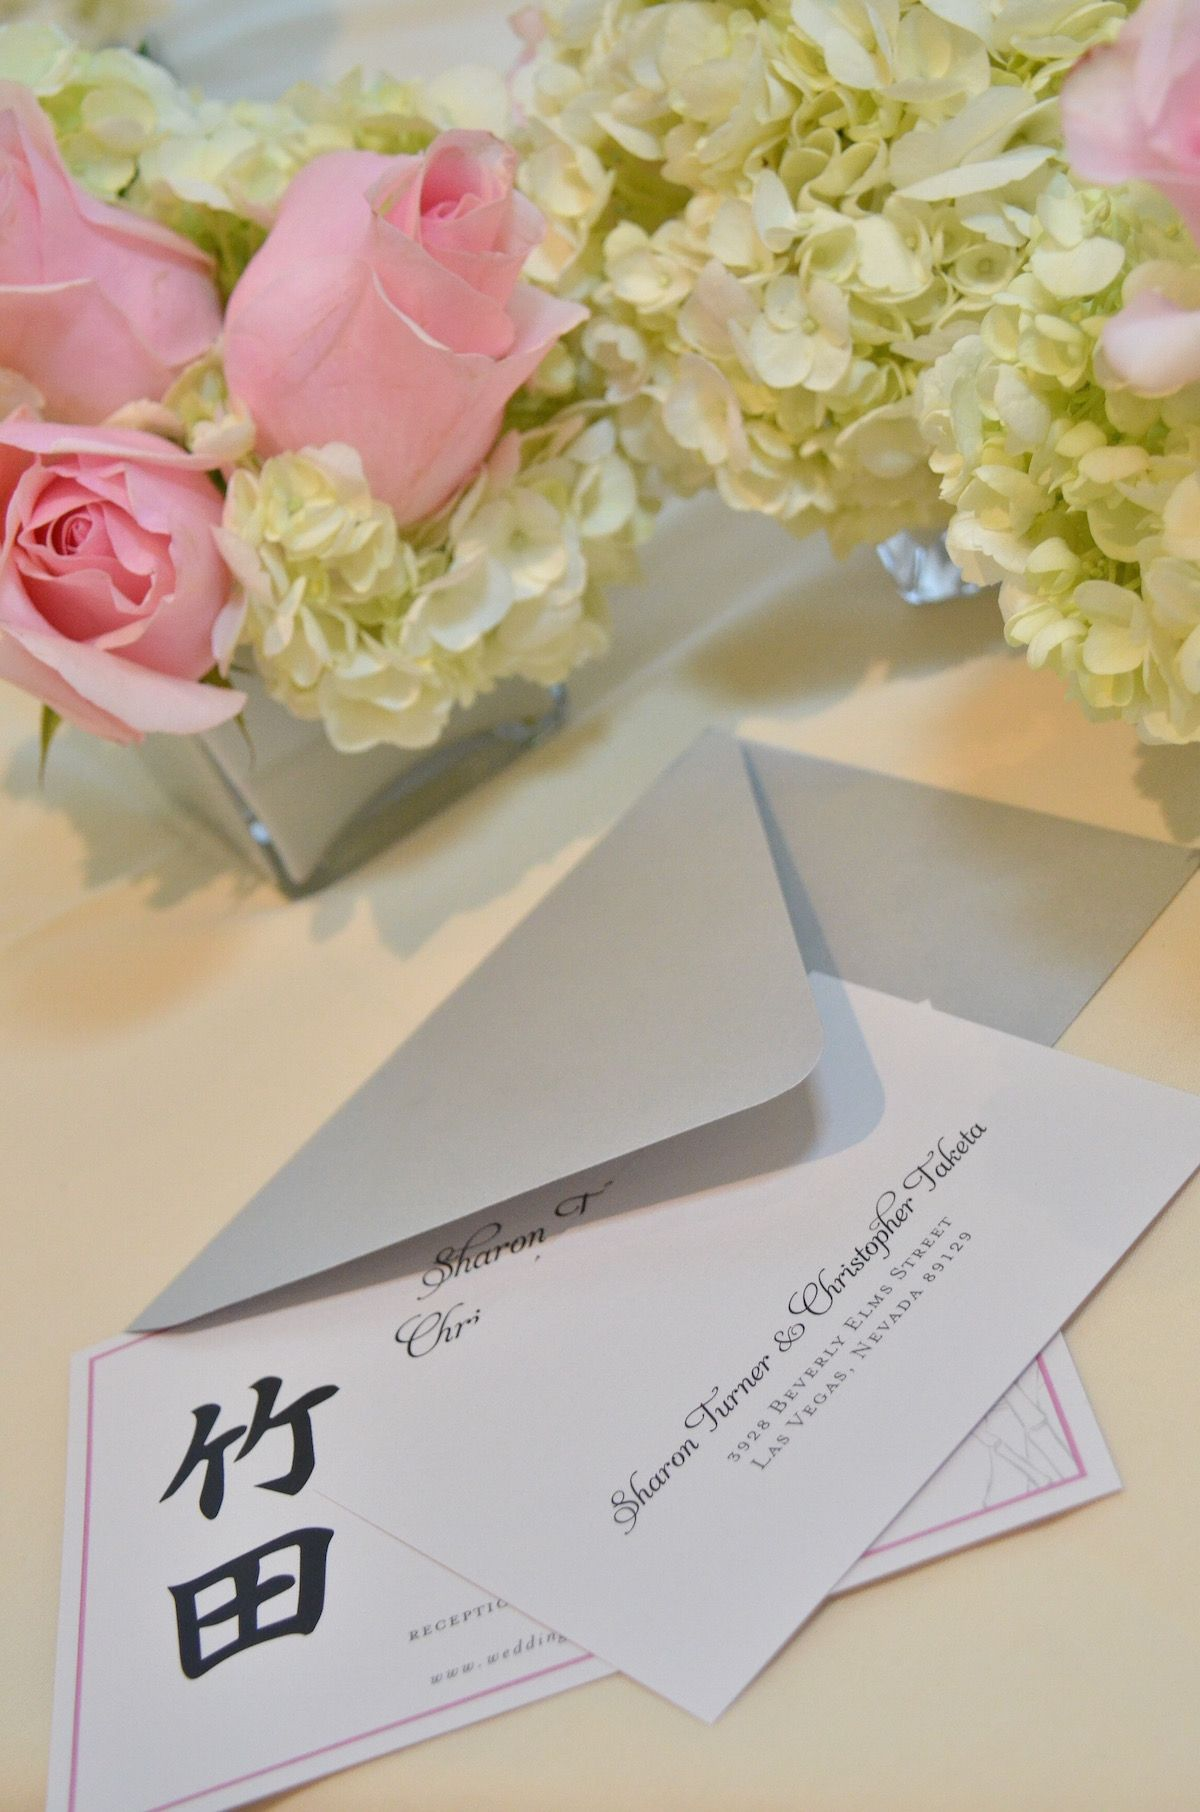 Japanese Wedding Invitations: Sharon and Chris | Wedding and Wedding